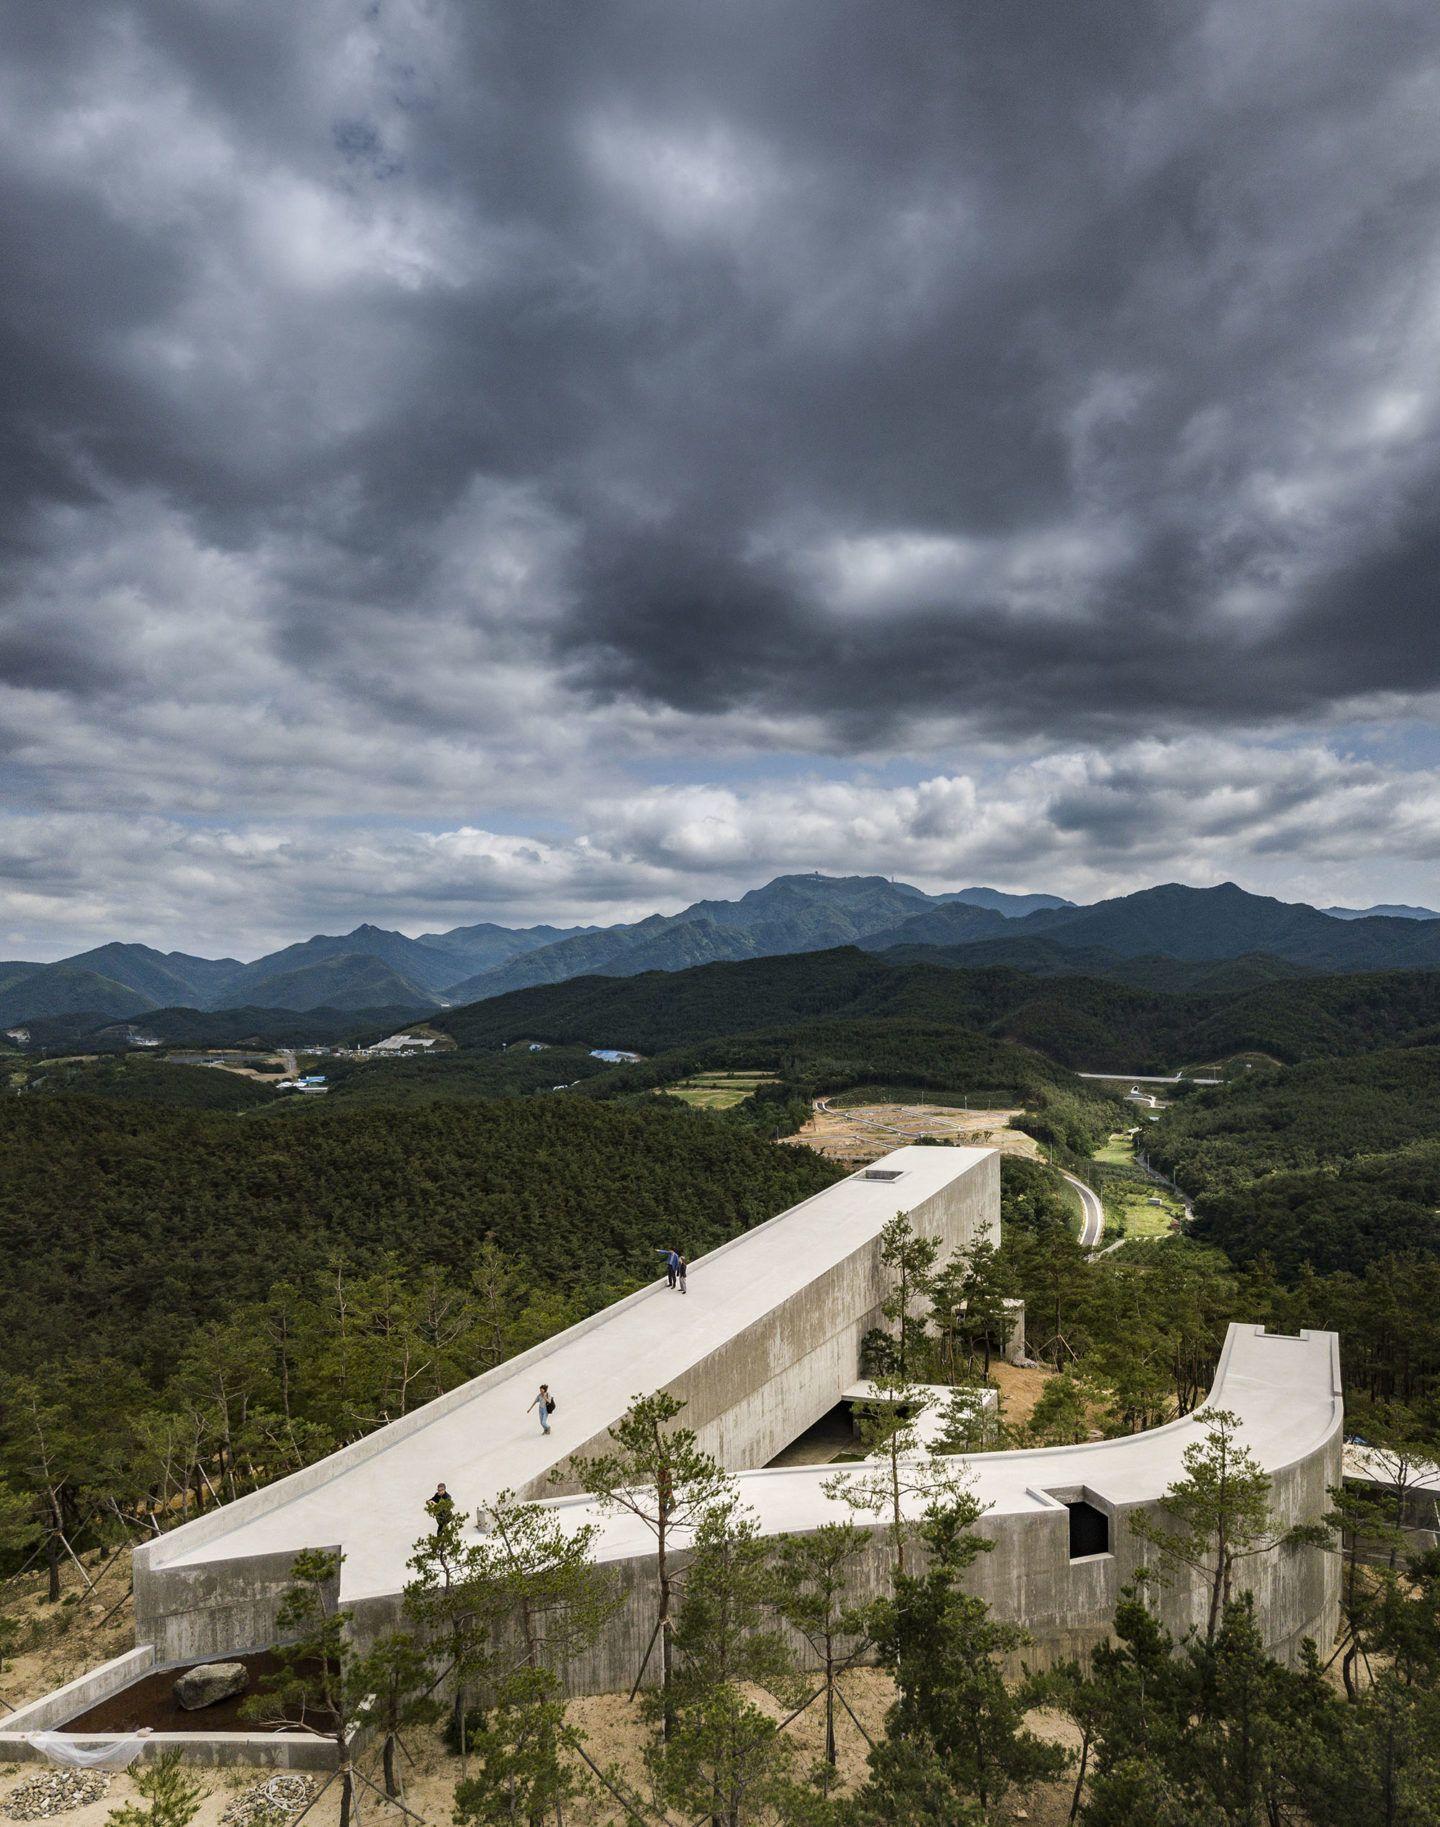 IGNANT-Architecture-Alvaro-Siza-Carlos-Castanheira-Art-Pavilion-Photographs-24